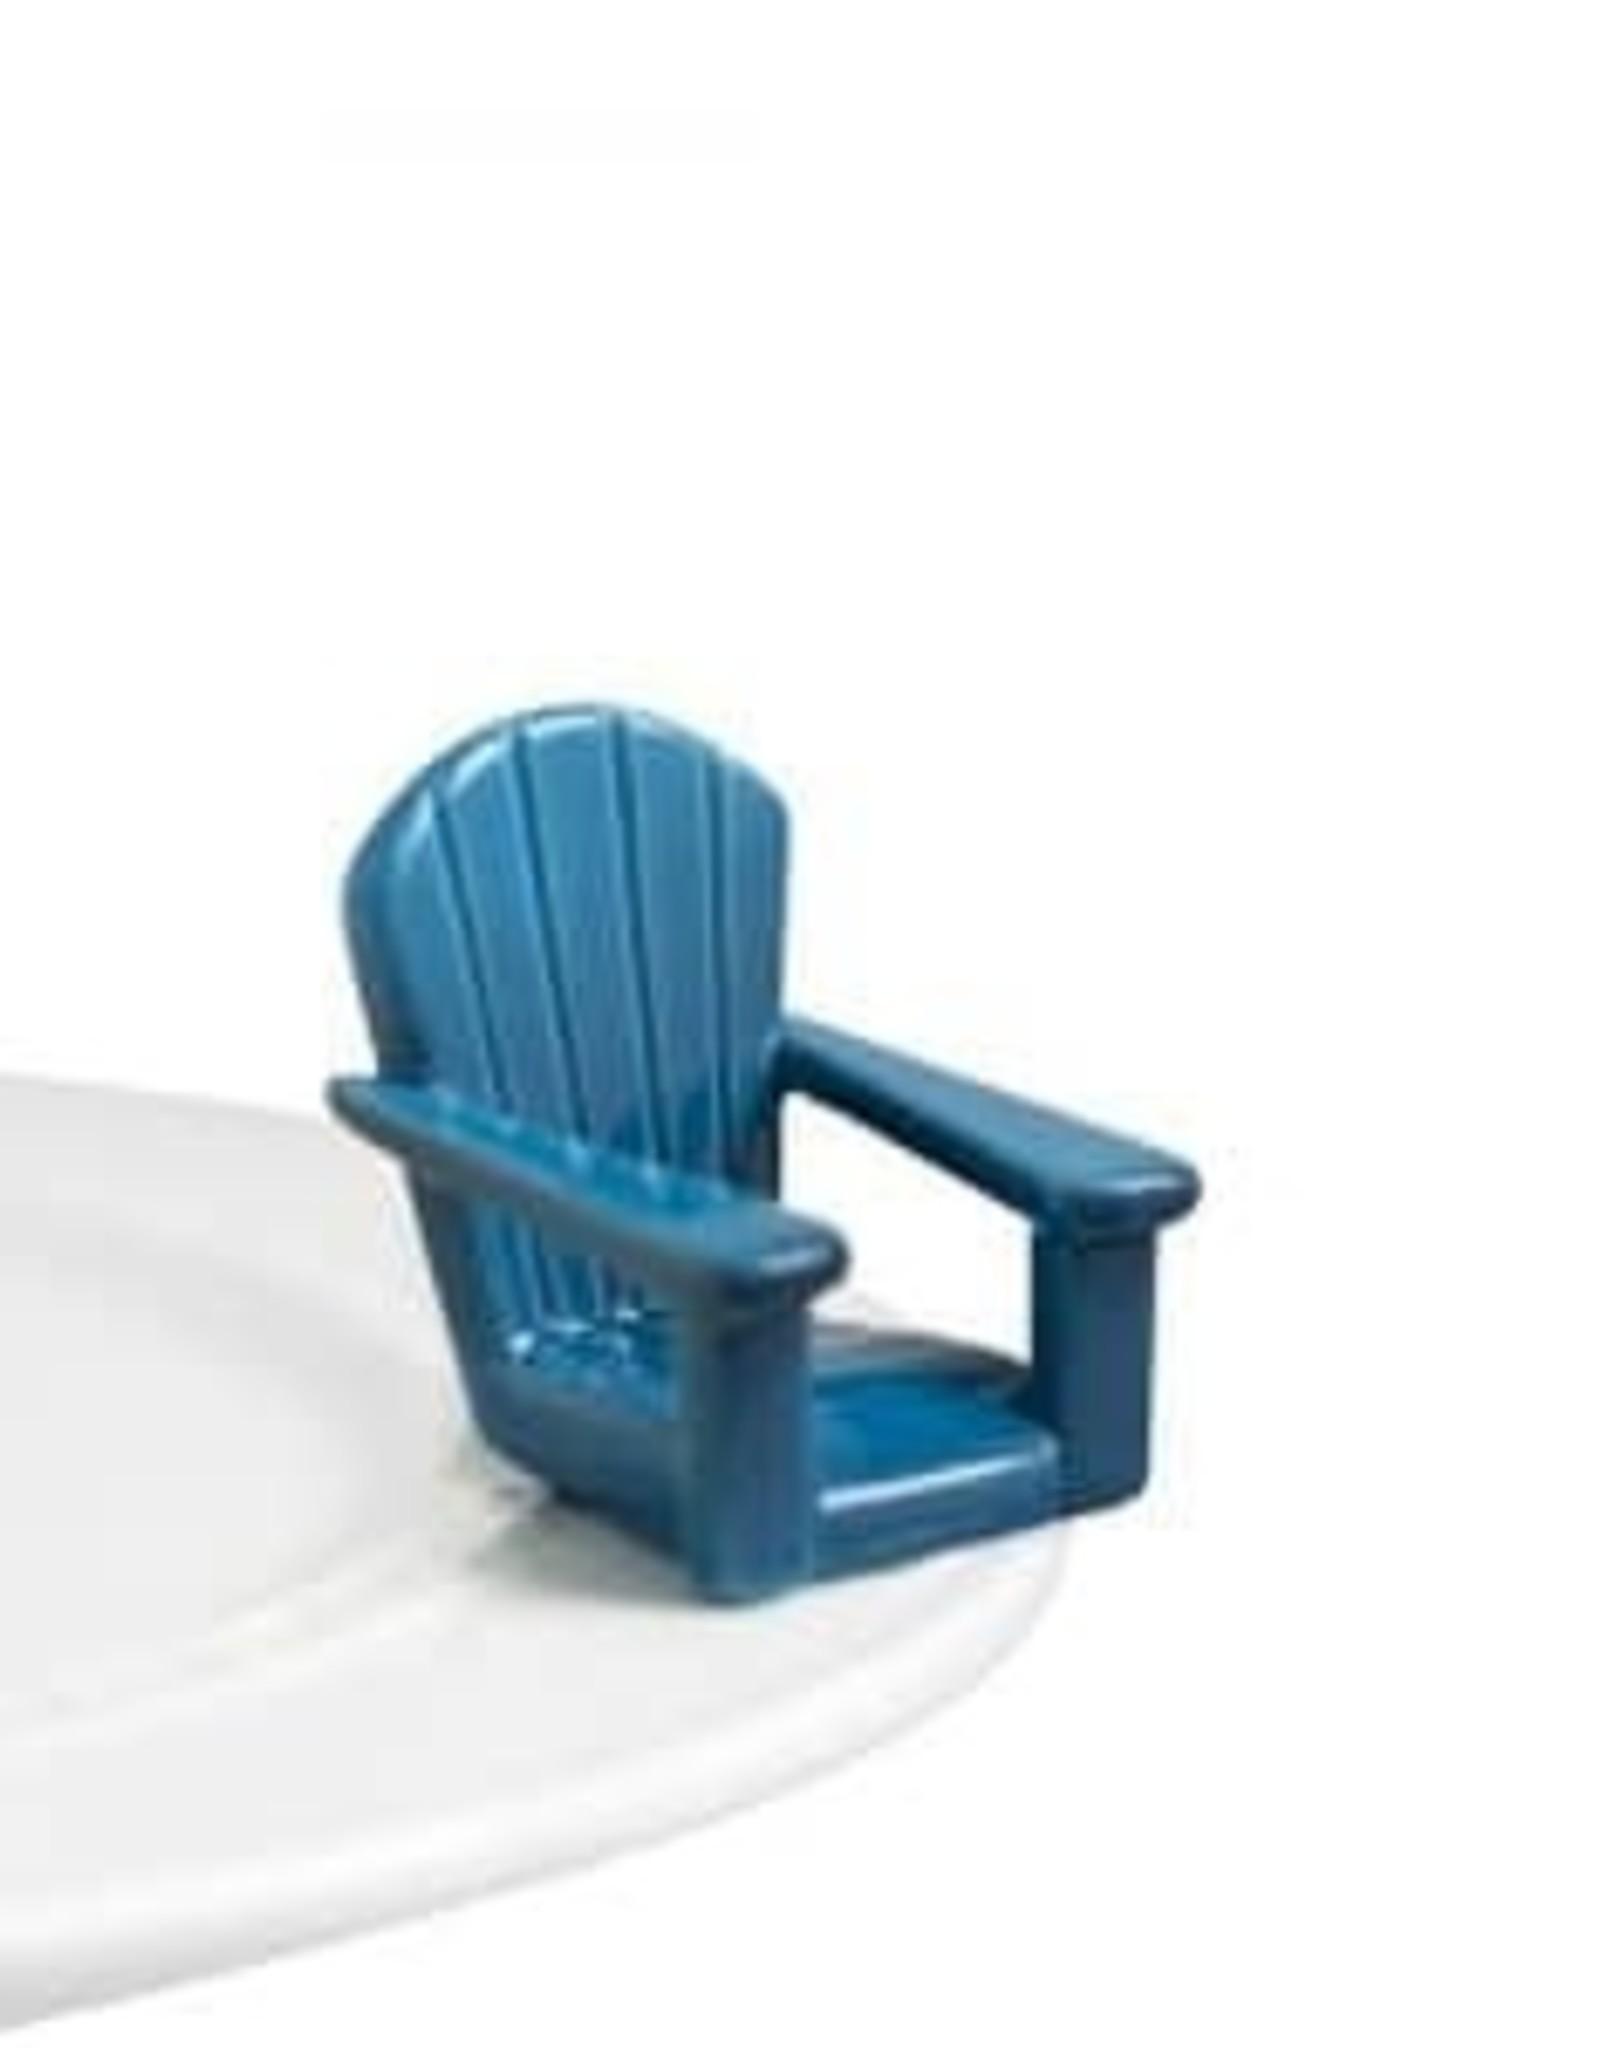 Nora Fleming chillin' chair (blue adirondack chair)